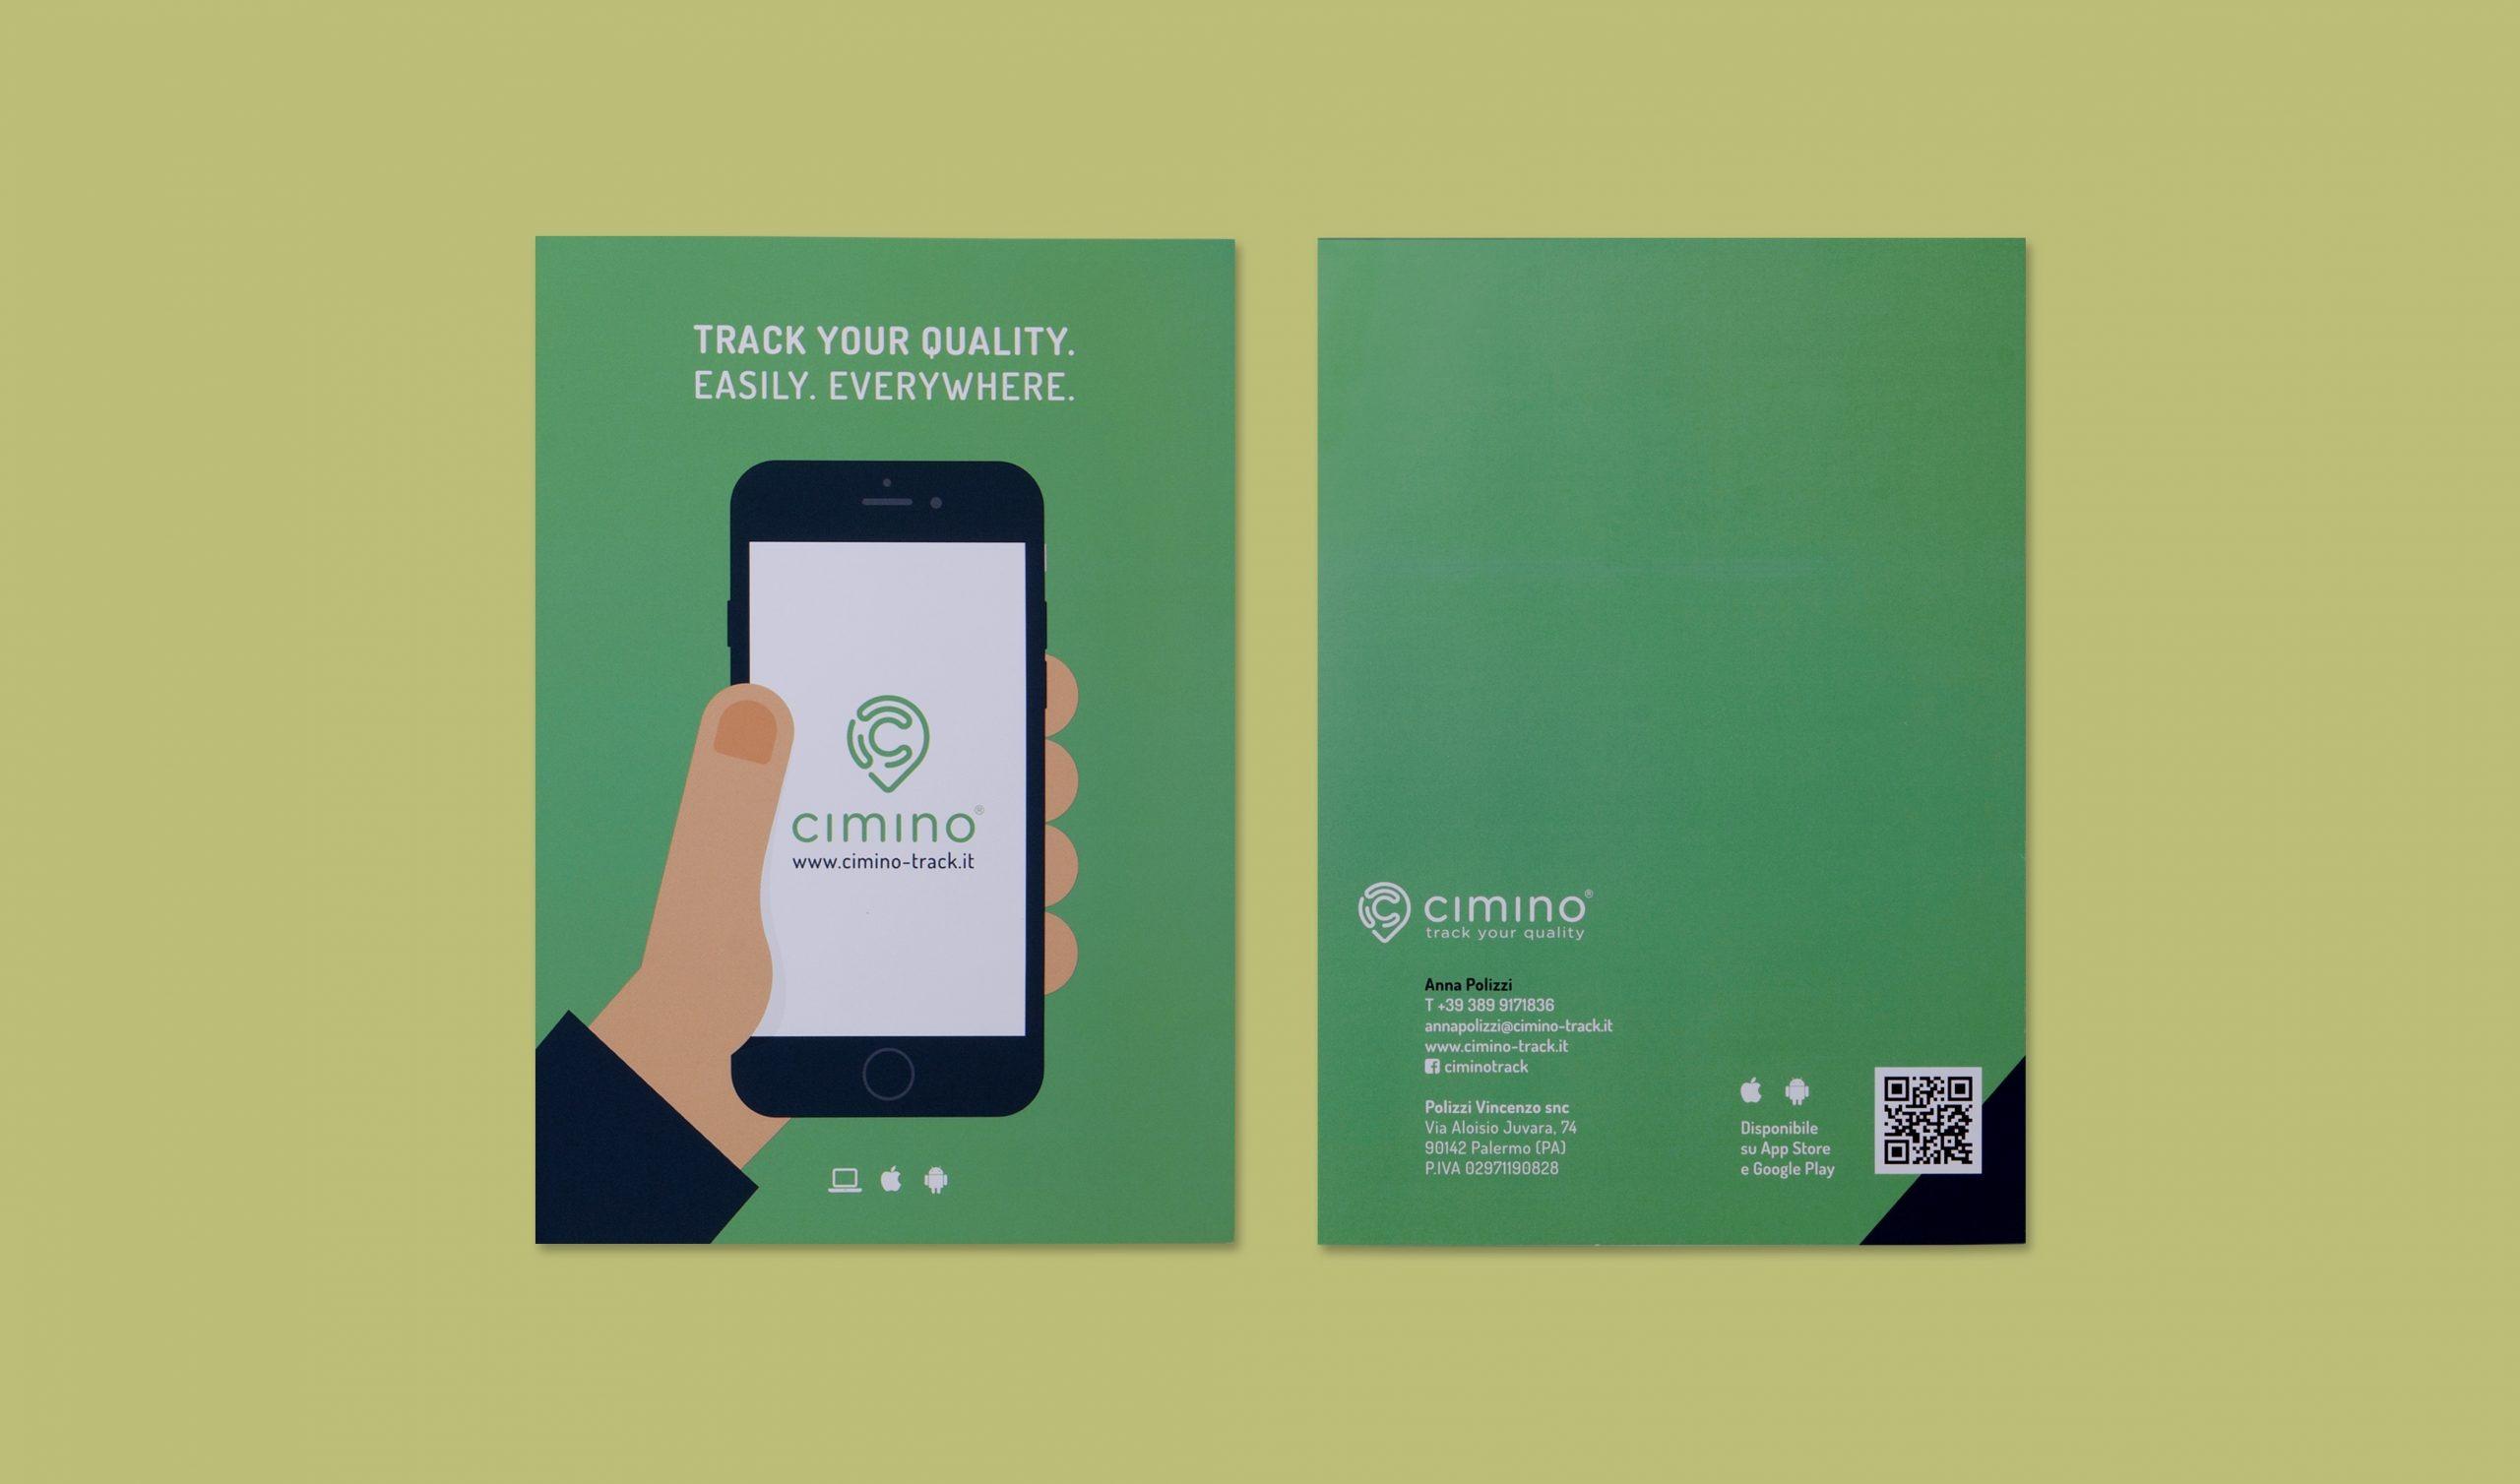 Cimino App - Corporate image